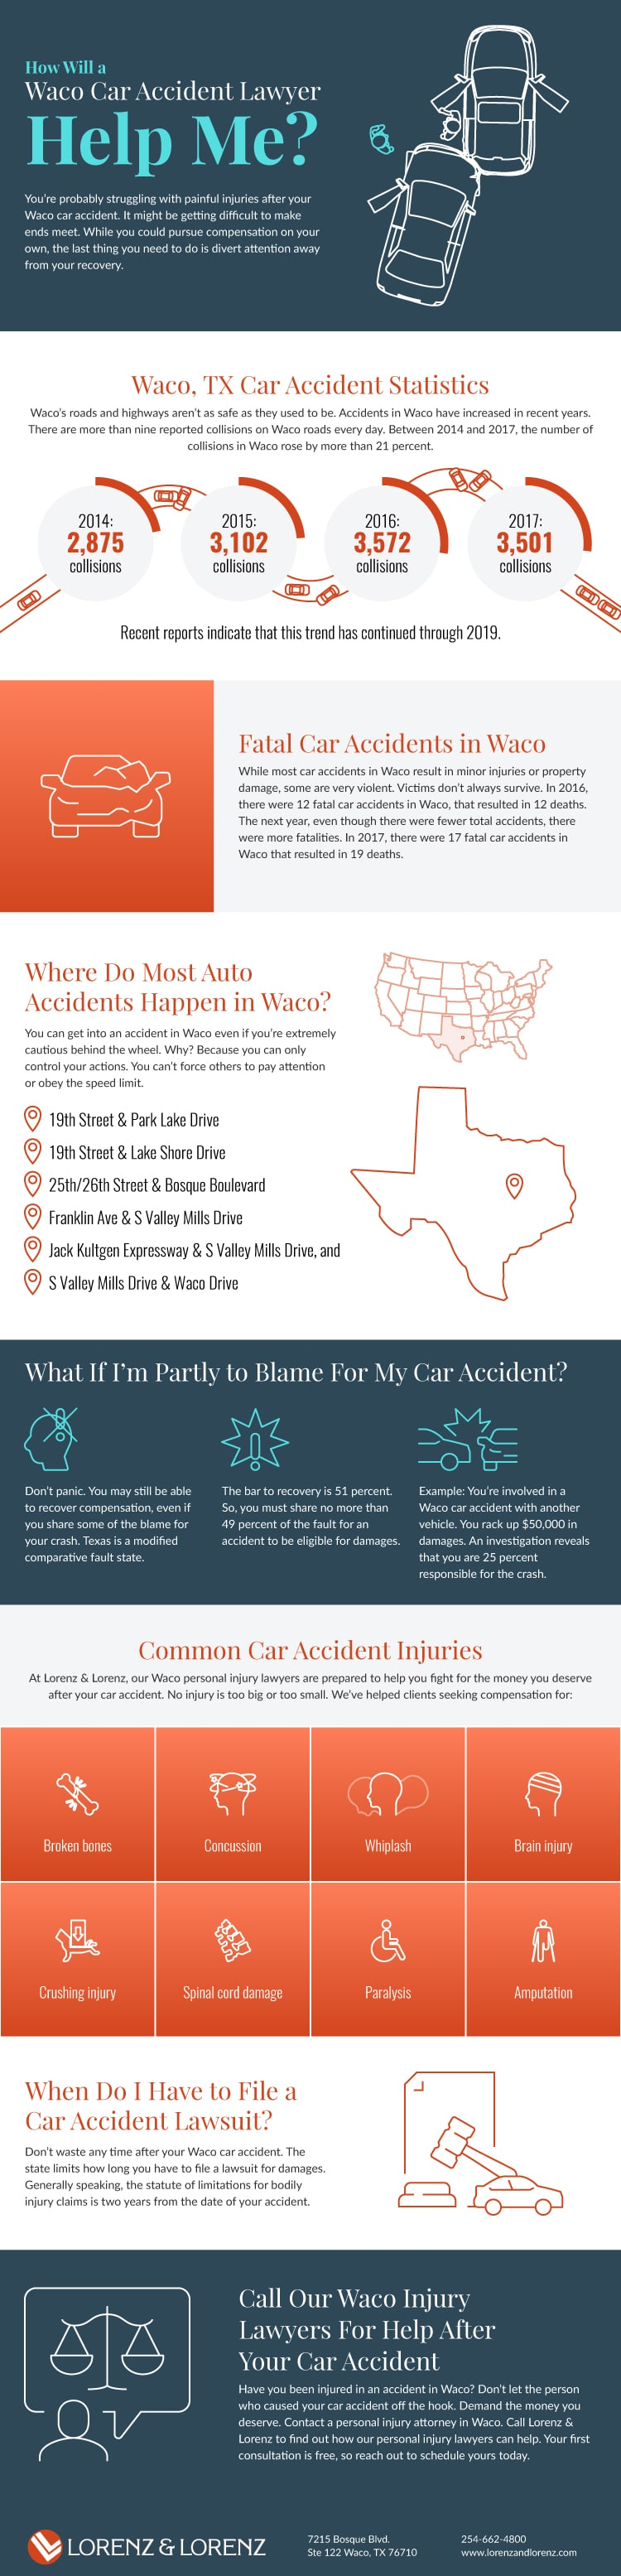 Waco car accident statistics infographic